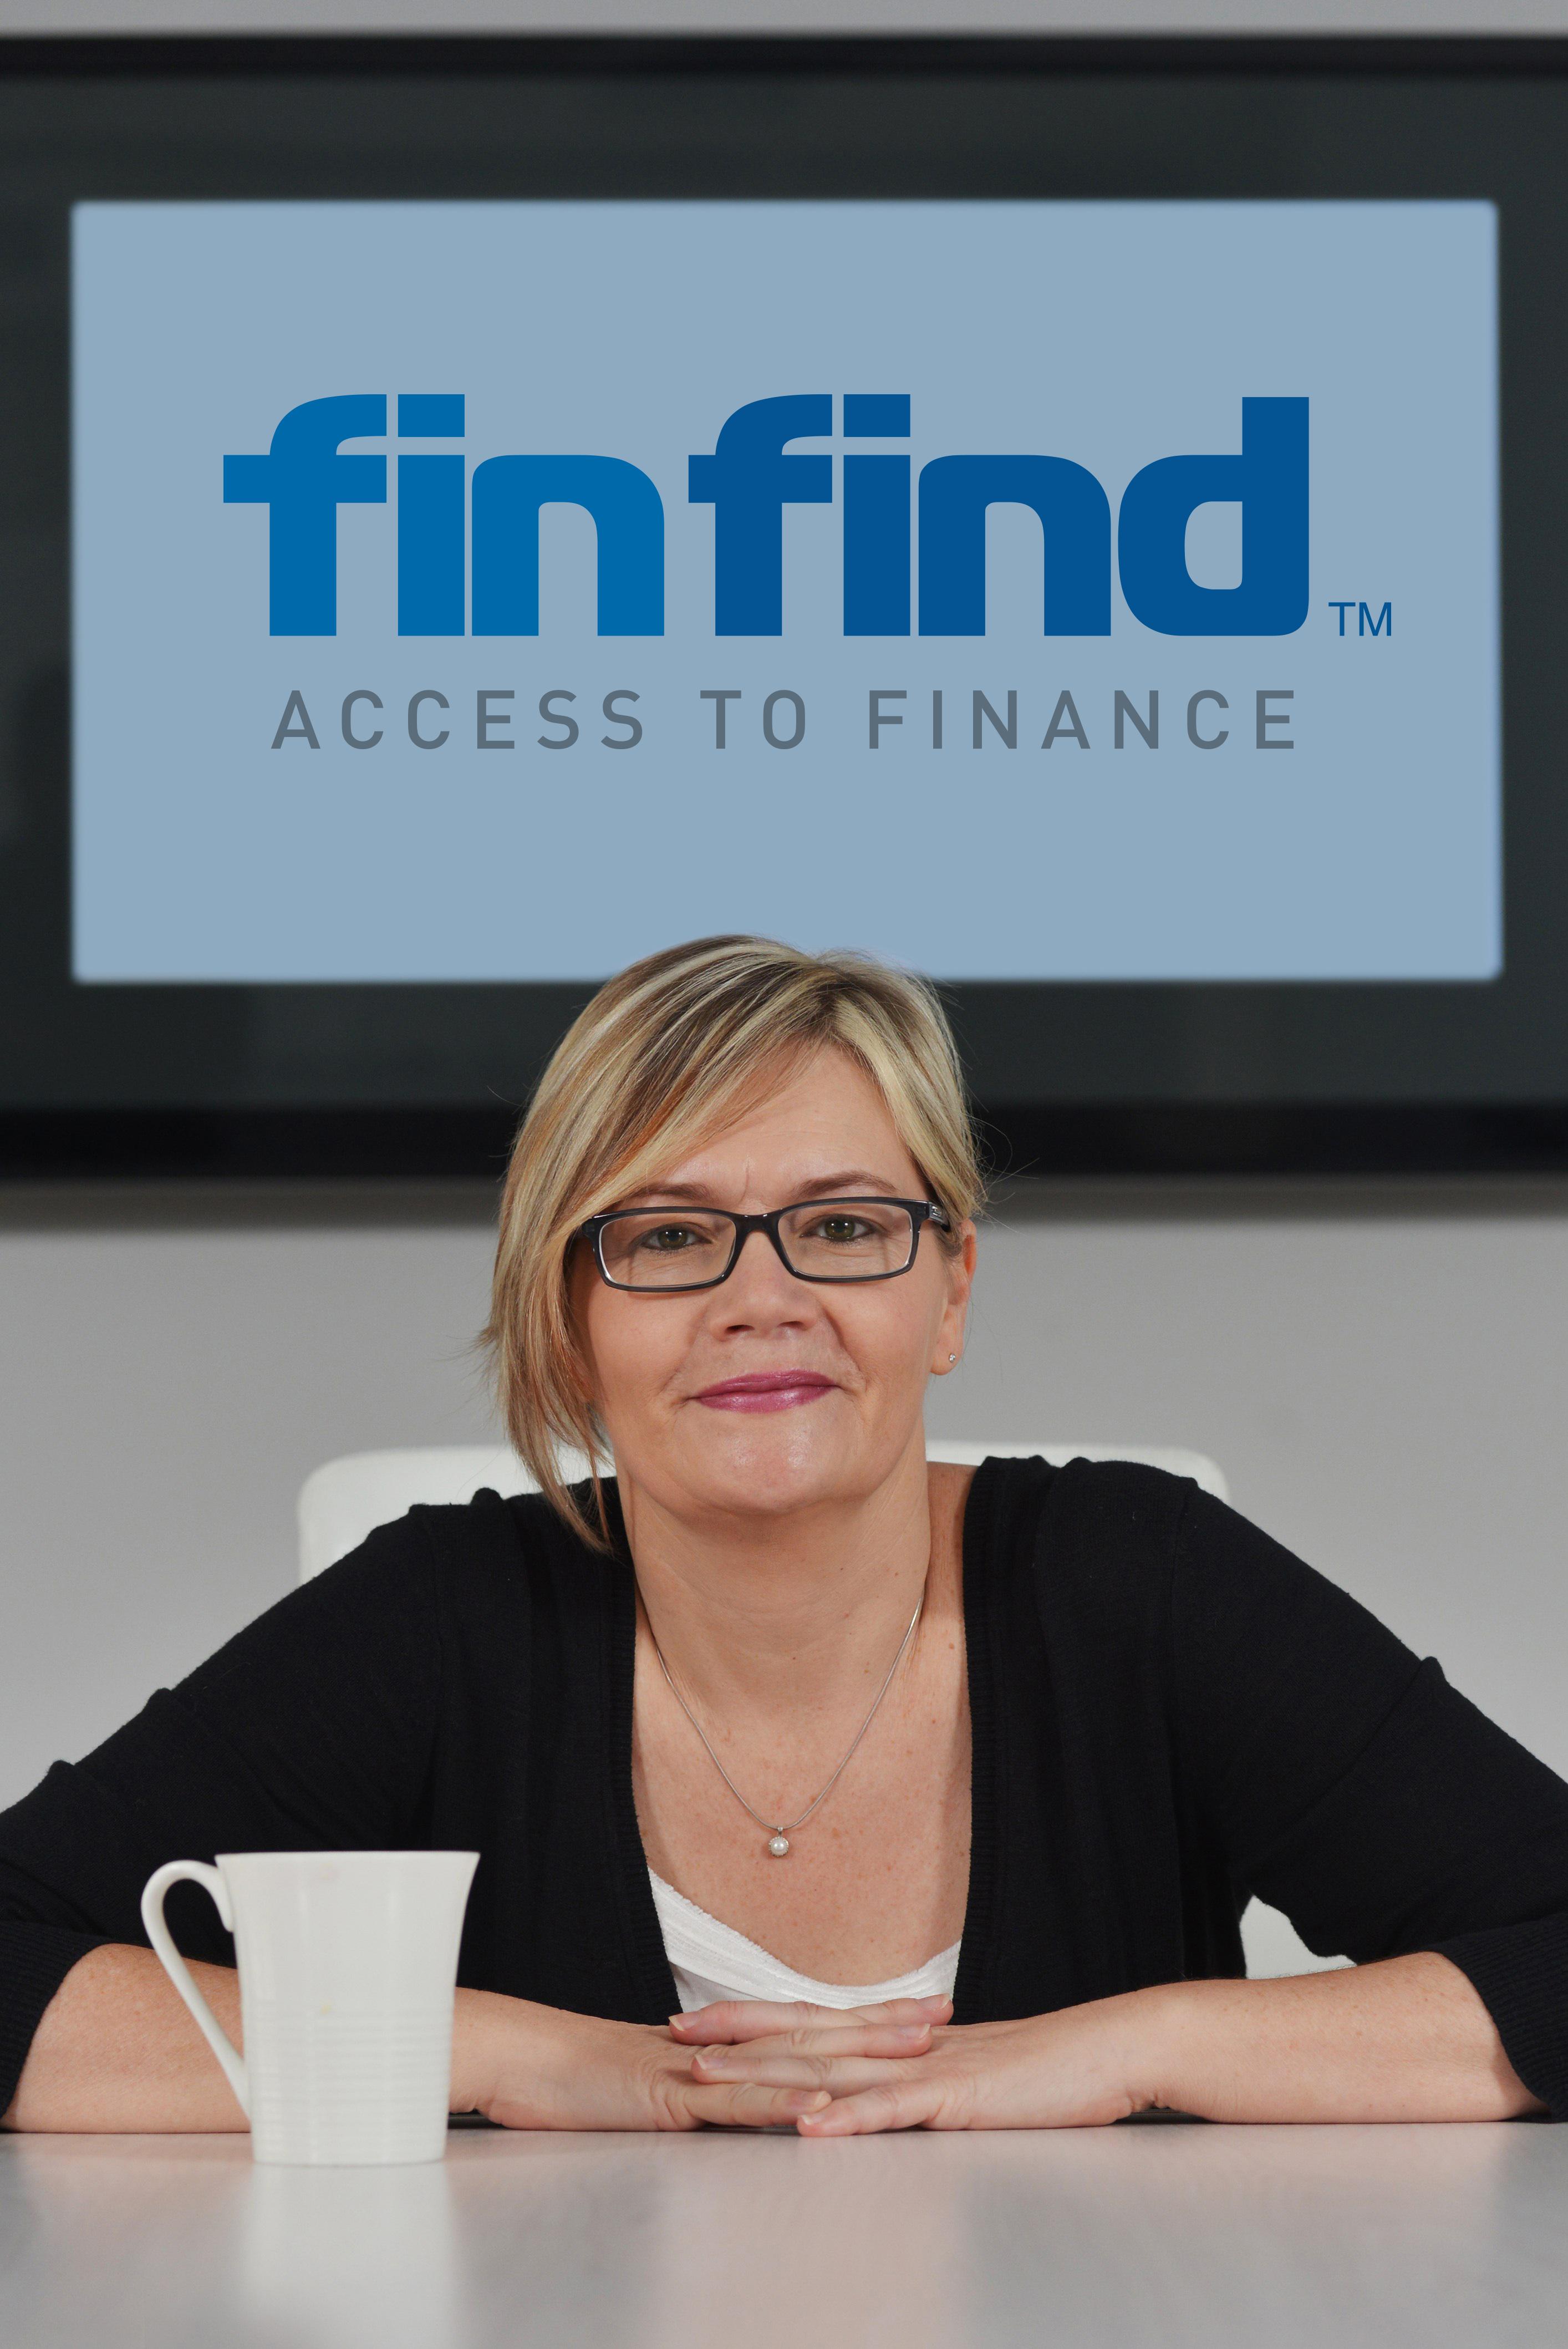 Darlene Menzies - CEO of Finfind